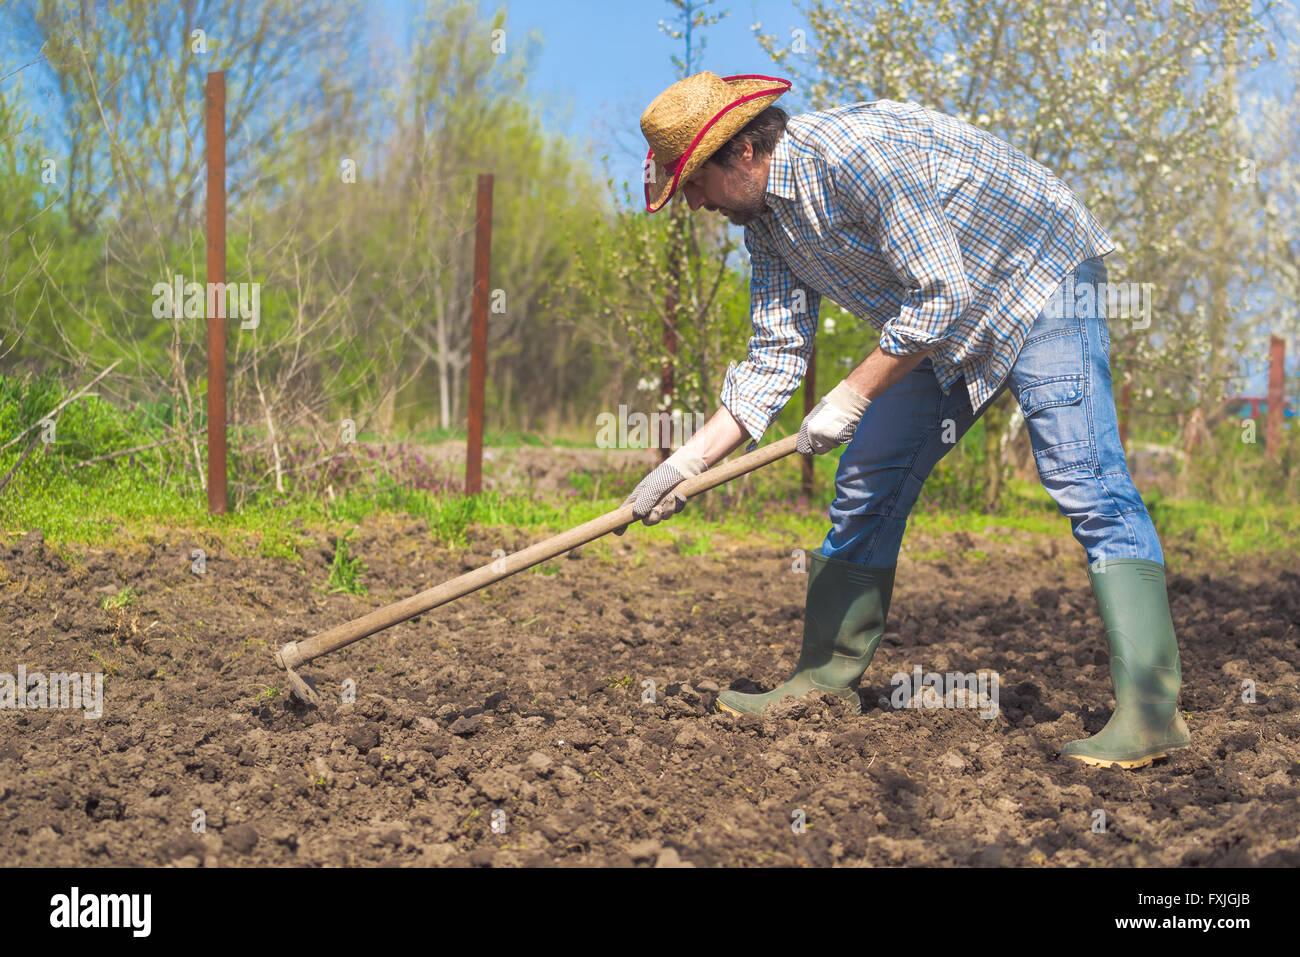 Man Hoeing Vegetable Garden Soil, New Growth Season On Organic Farm